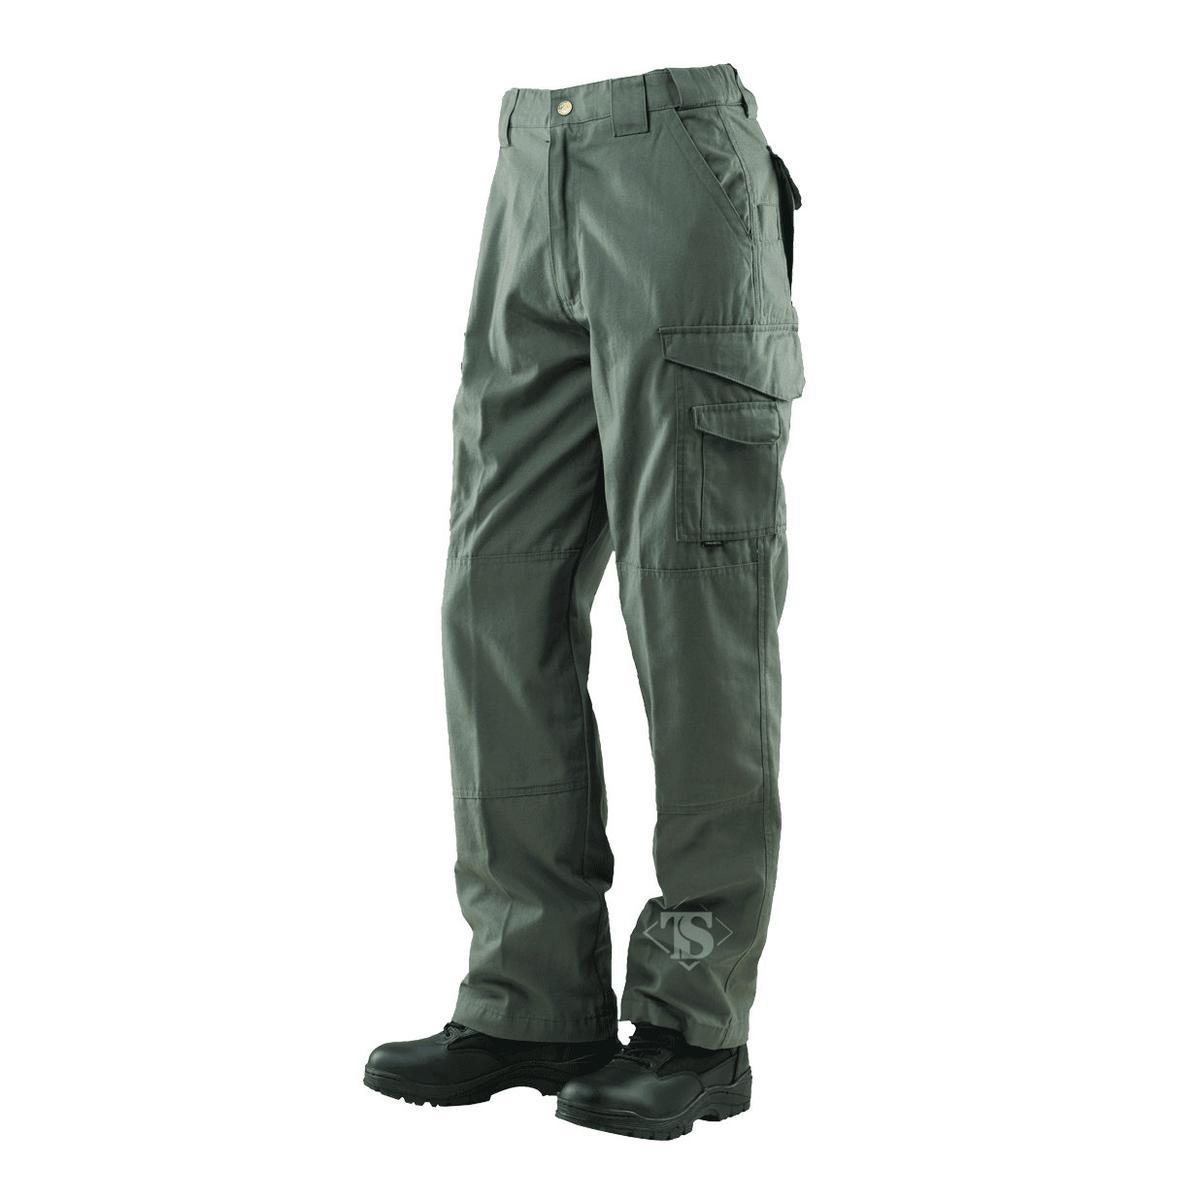 Tru-Spec 1071 24-7 Men's Tactical Pants, 100% Cotton, Olive Drab